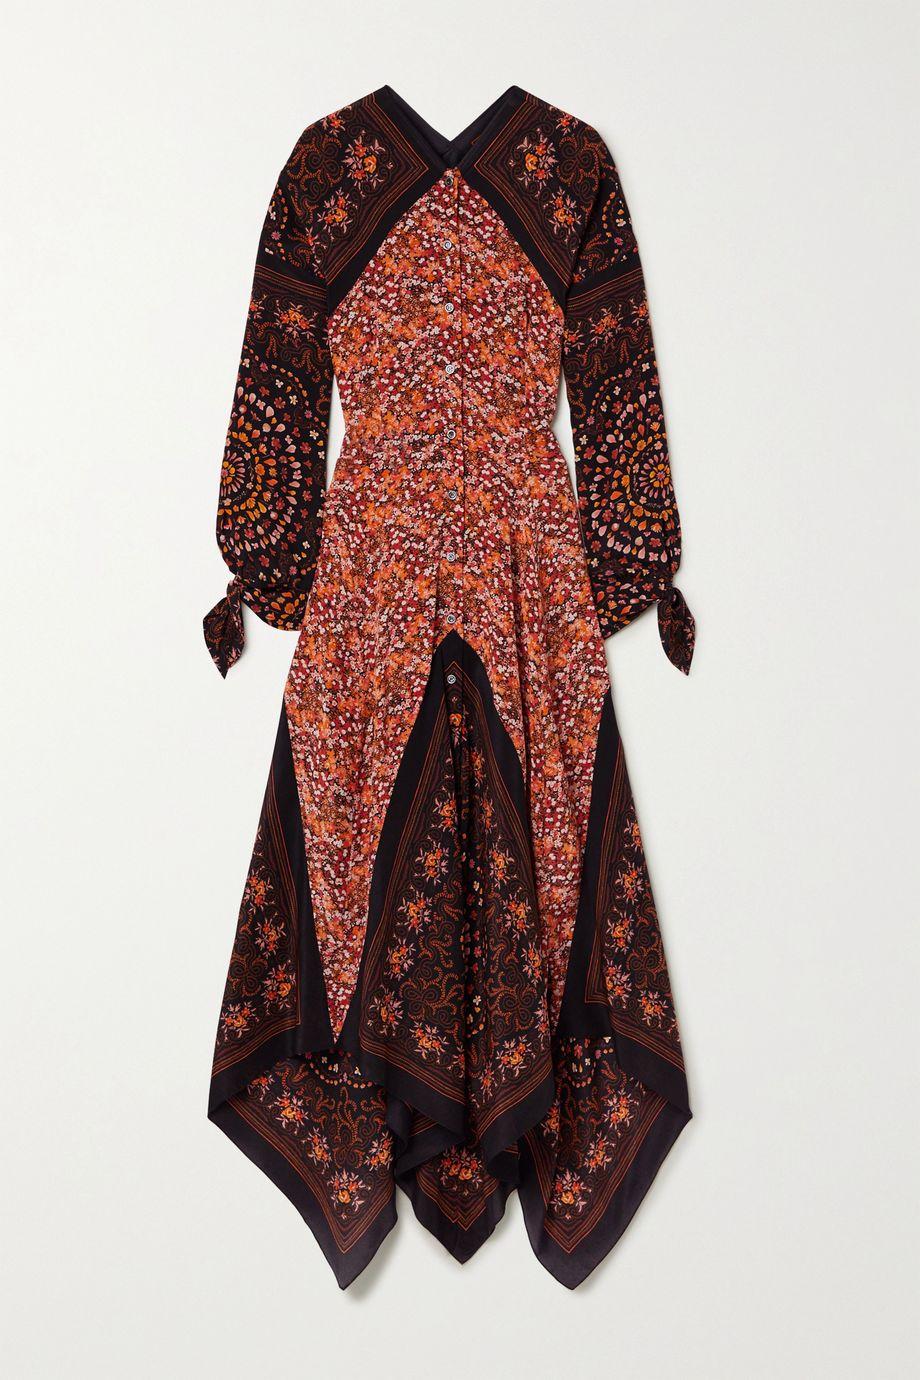 Altuzarra Northwest paneled floral-print silk crepe de chine dress